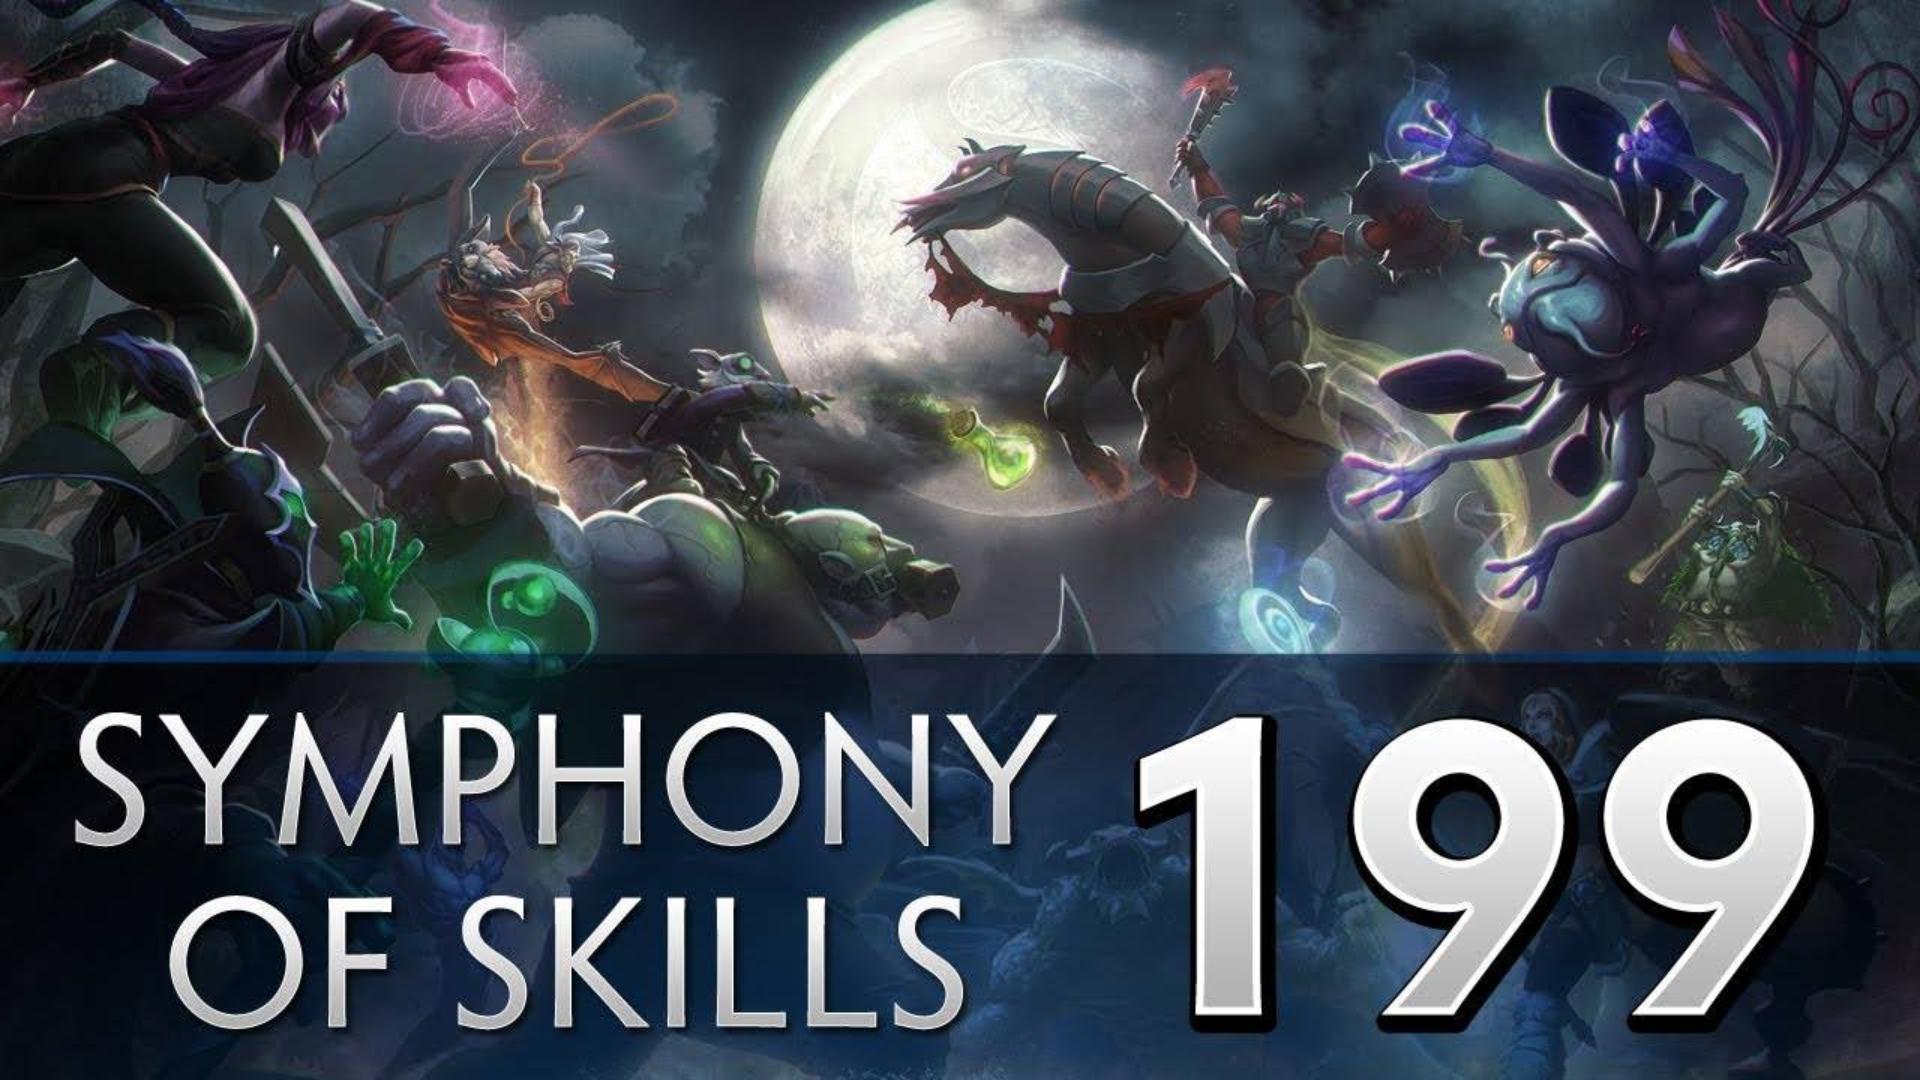 Dota 2 Symphony of Skills 199